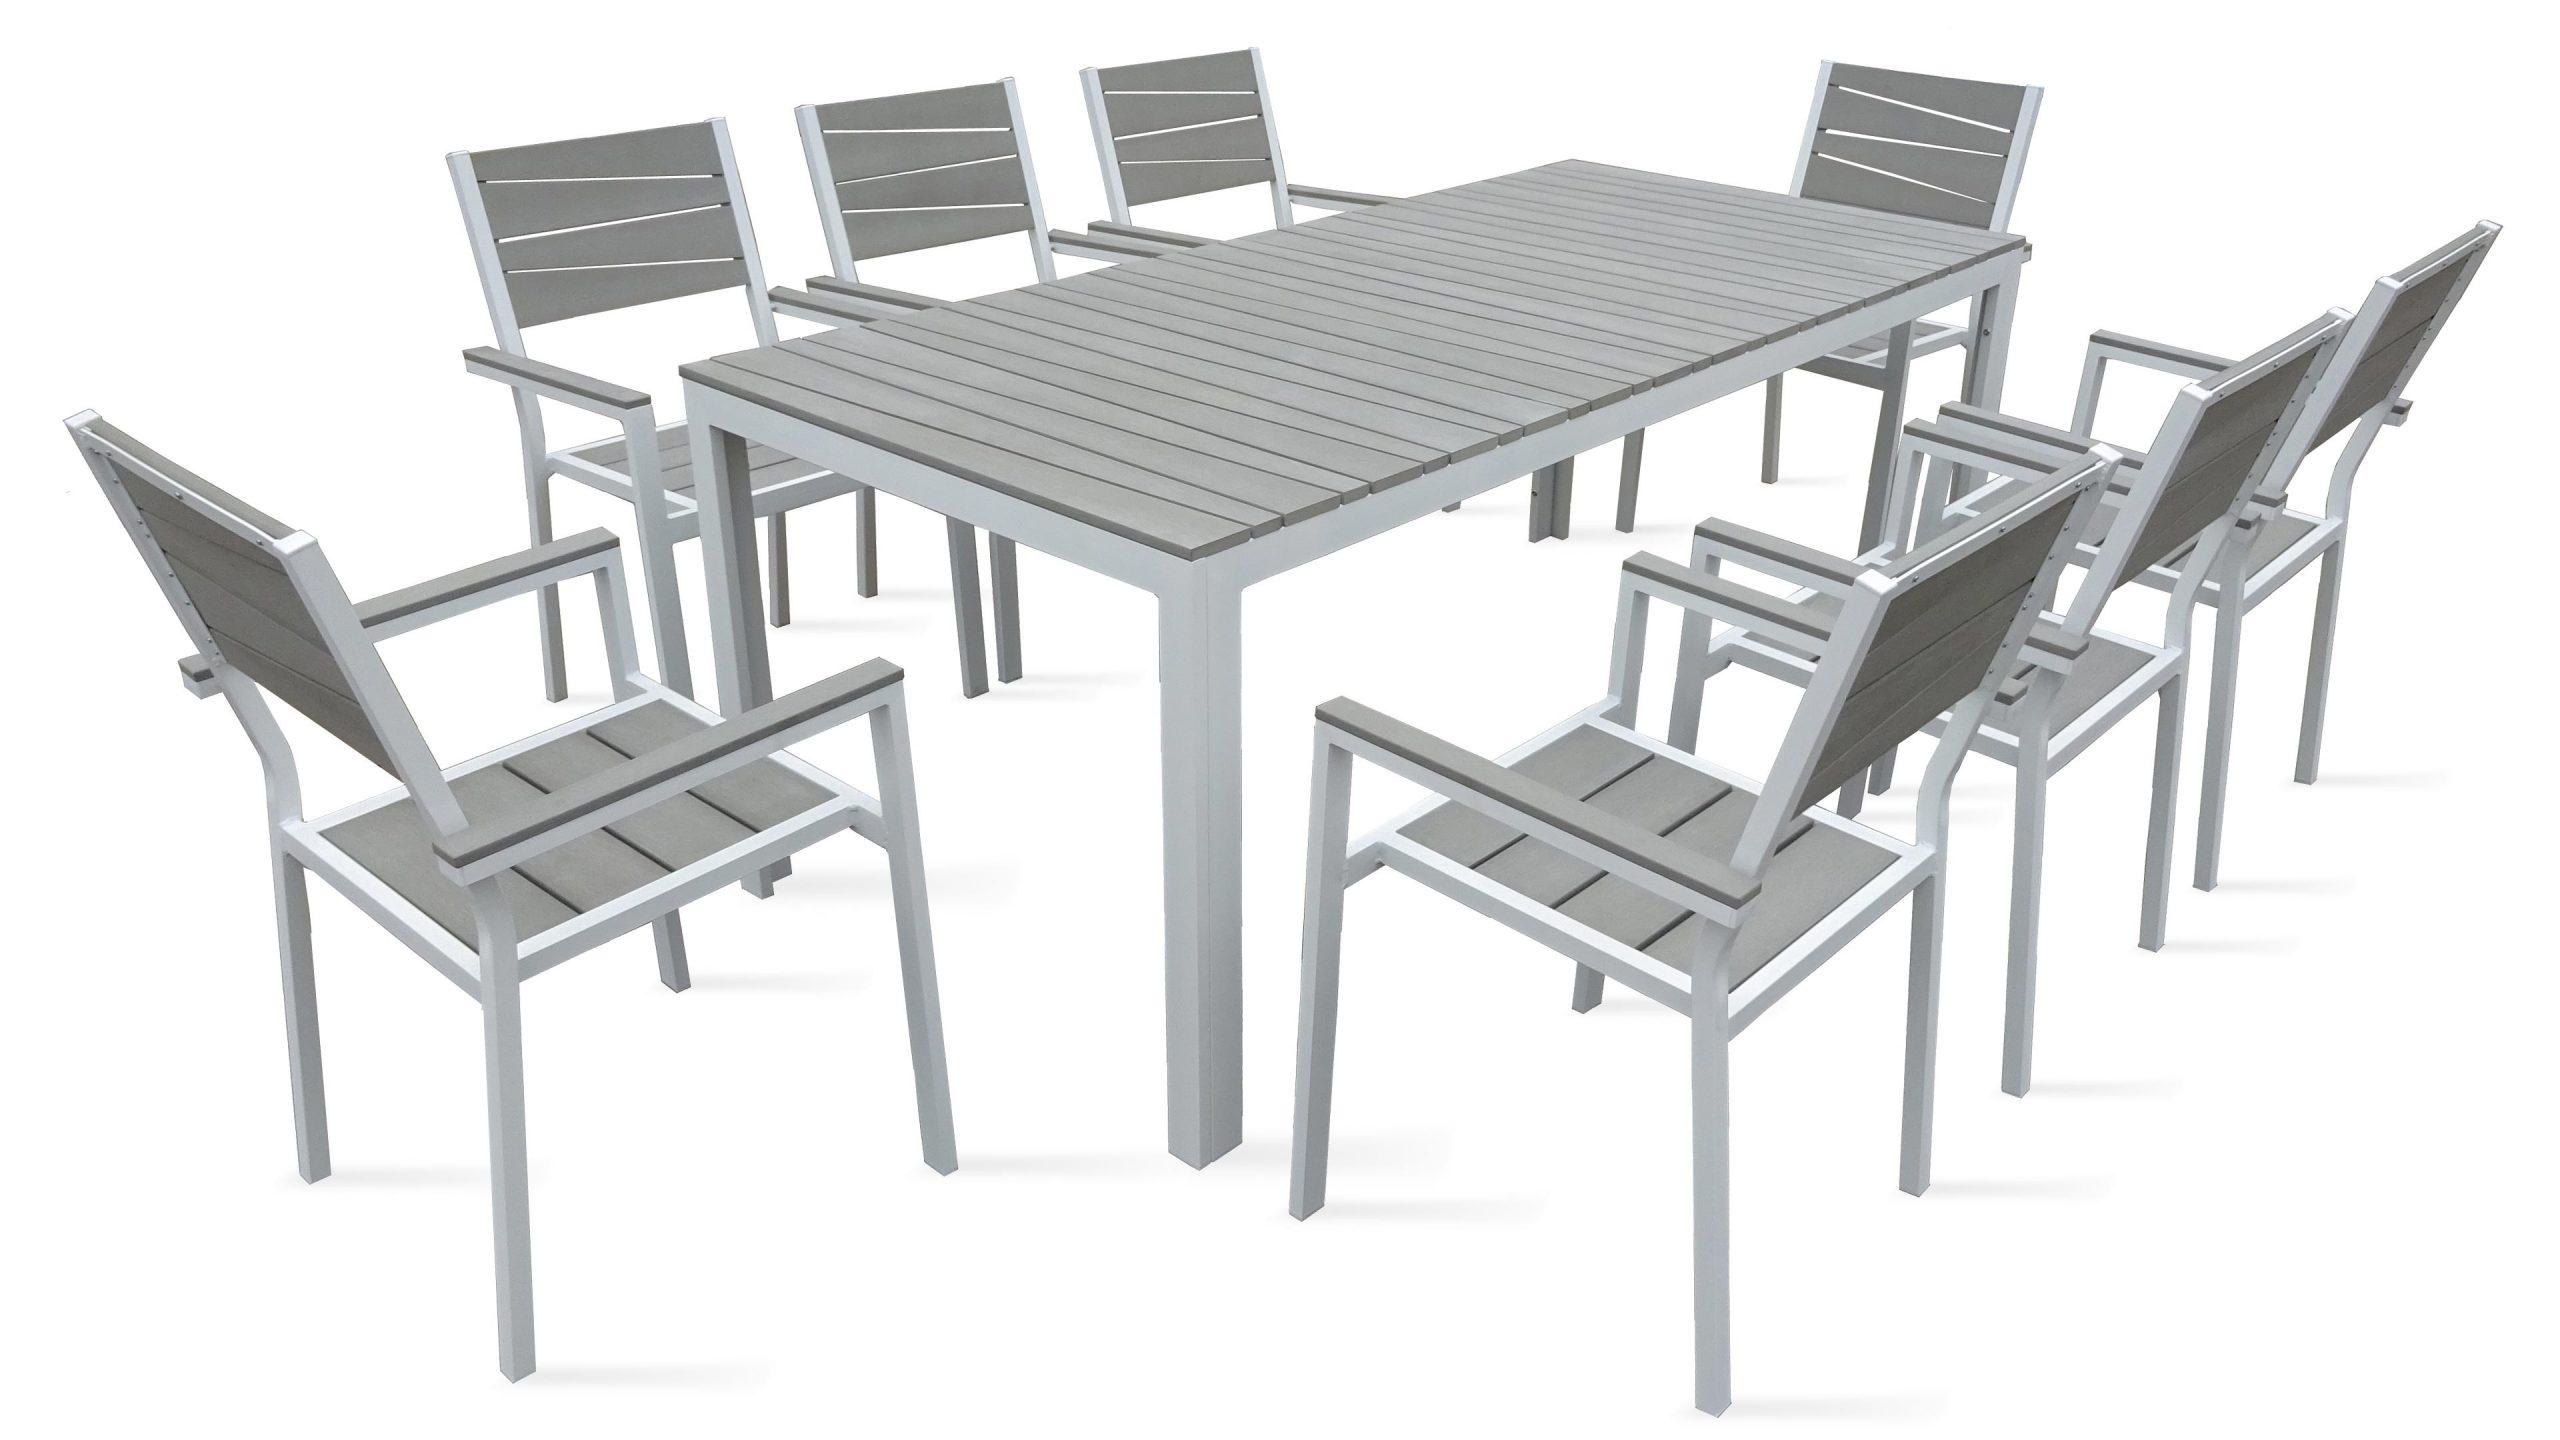 Table De Jardin 8 Places Aluminium Polywood destiné Table Et Chaise De Jardin En Aluminium